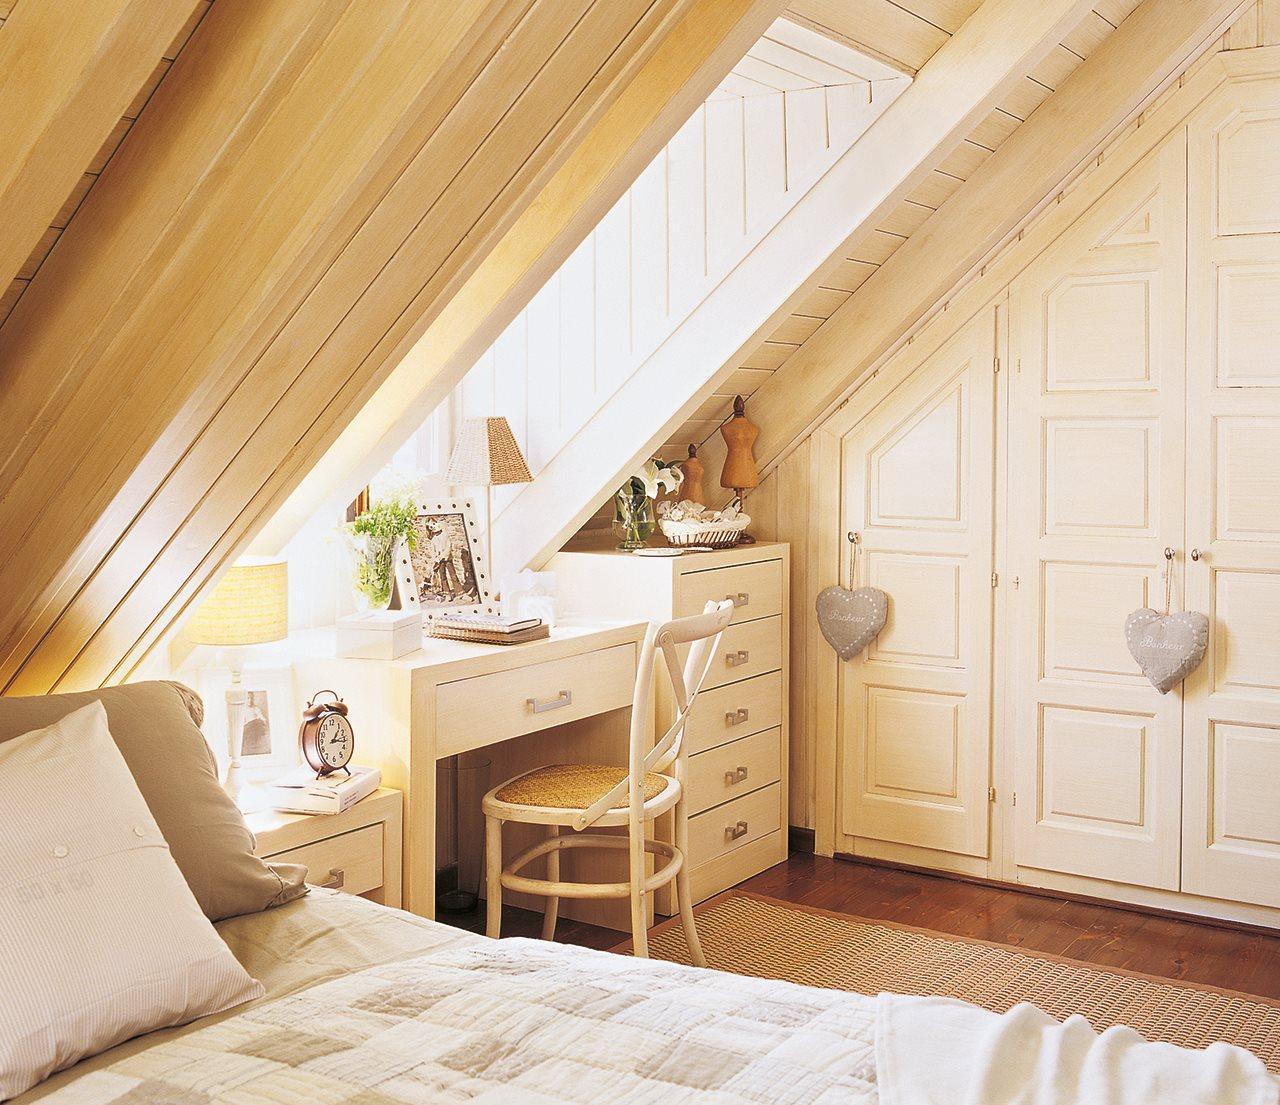 Ideas con muebles a medida para aprovechar rincones dif ciles - Ideas para armarios empotrados pequenos ...